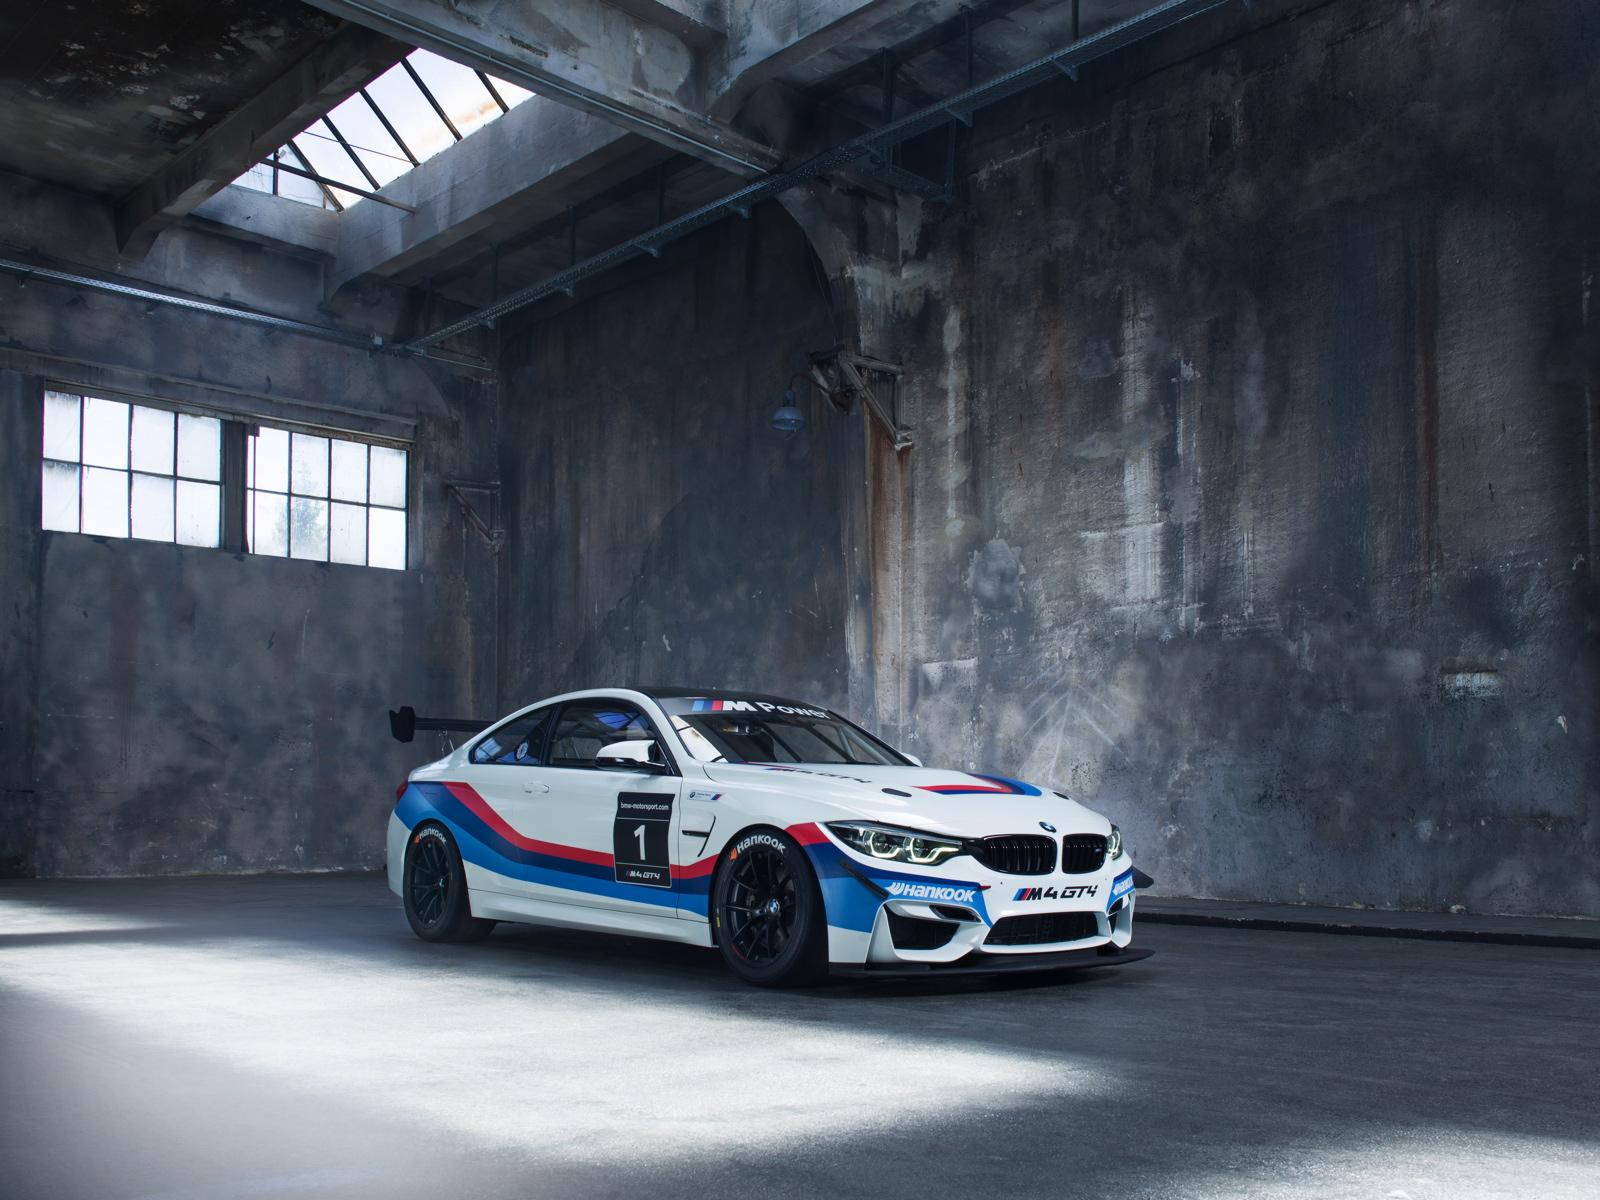 BMW M4 GT4 01